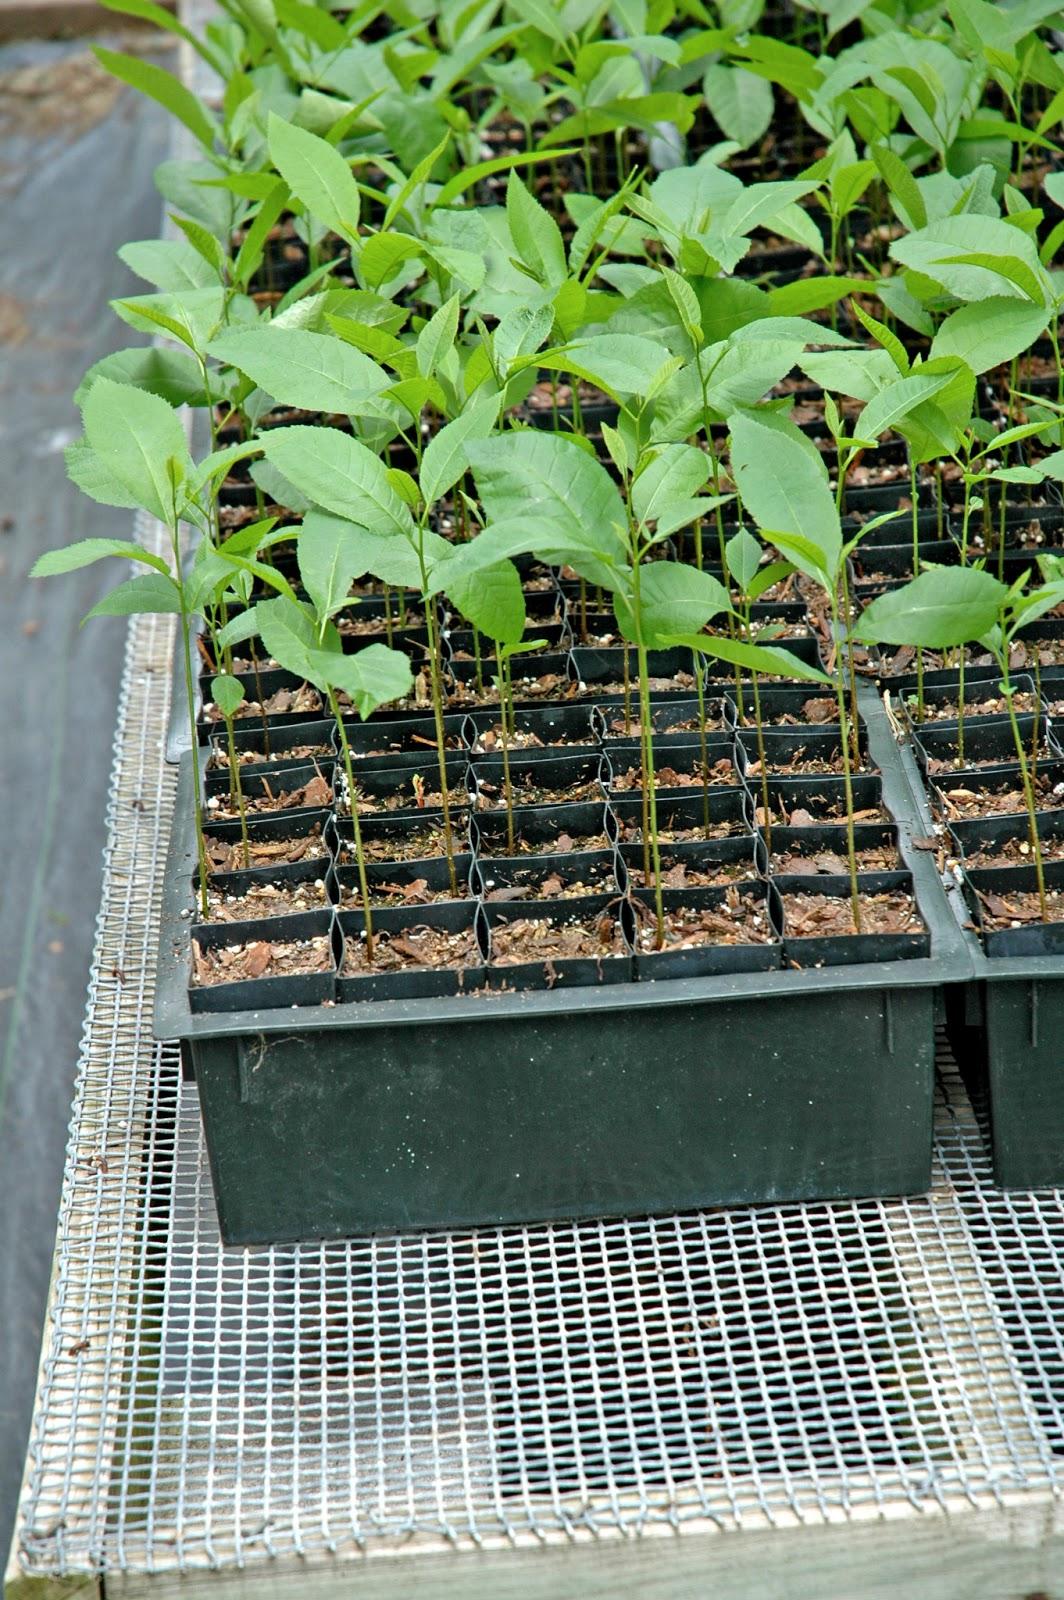 Northern Pecans Growing Pecan Seedlings In Containers